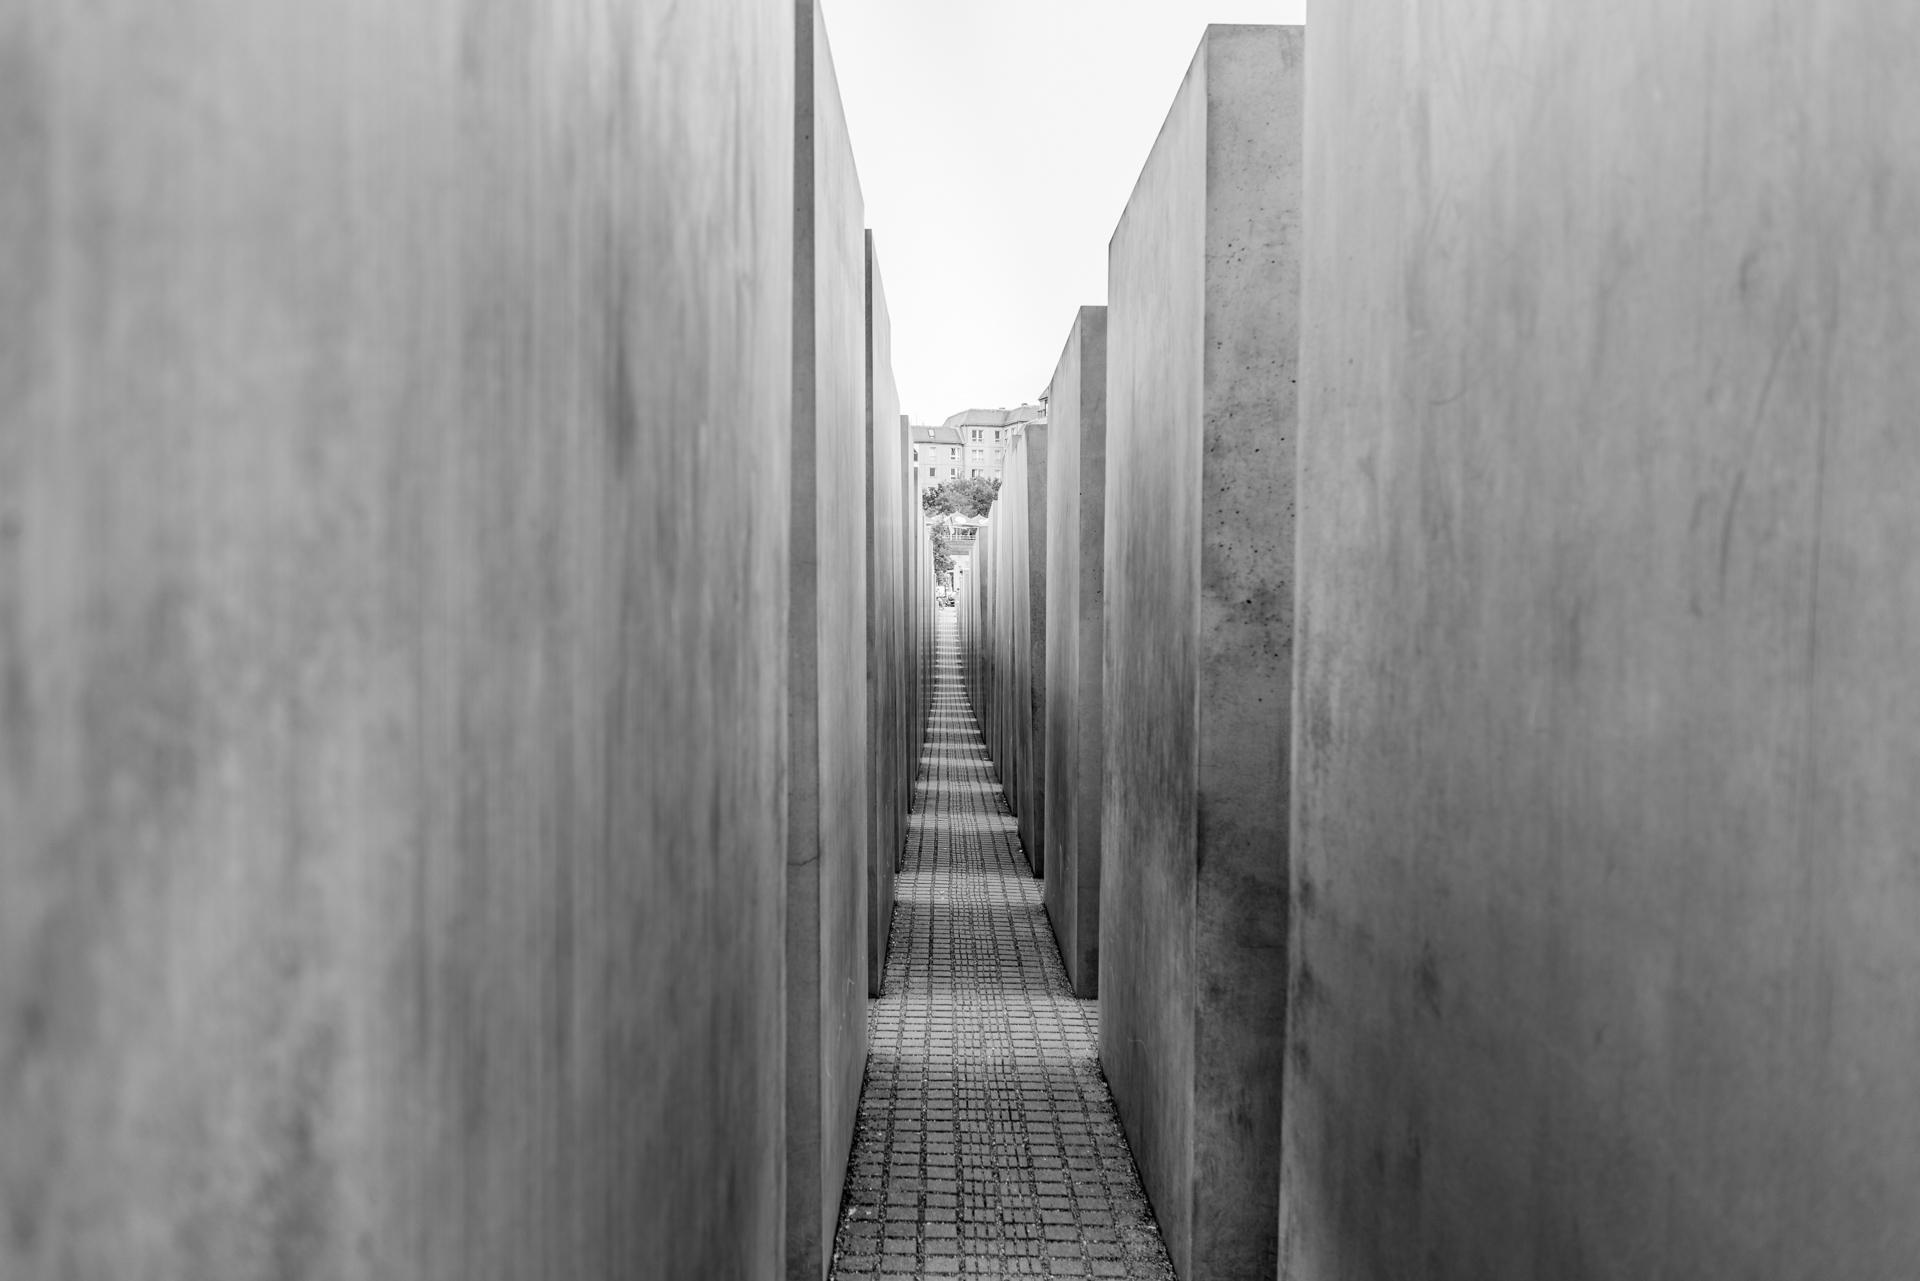 More than 2700 concrete slabs make up the memorial